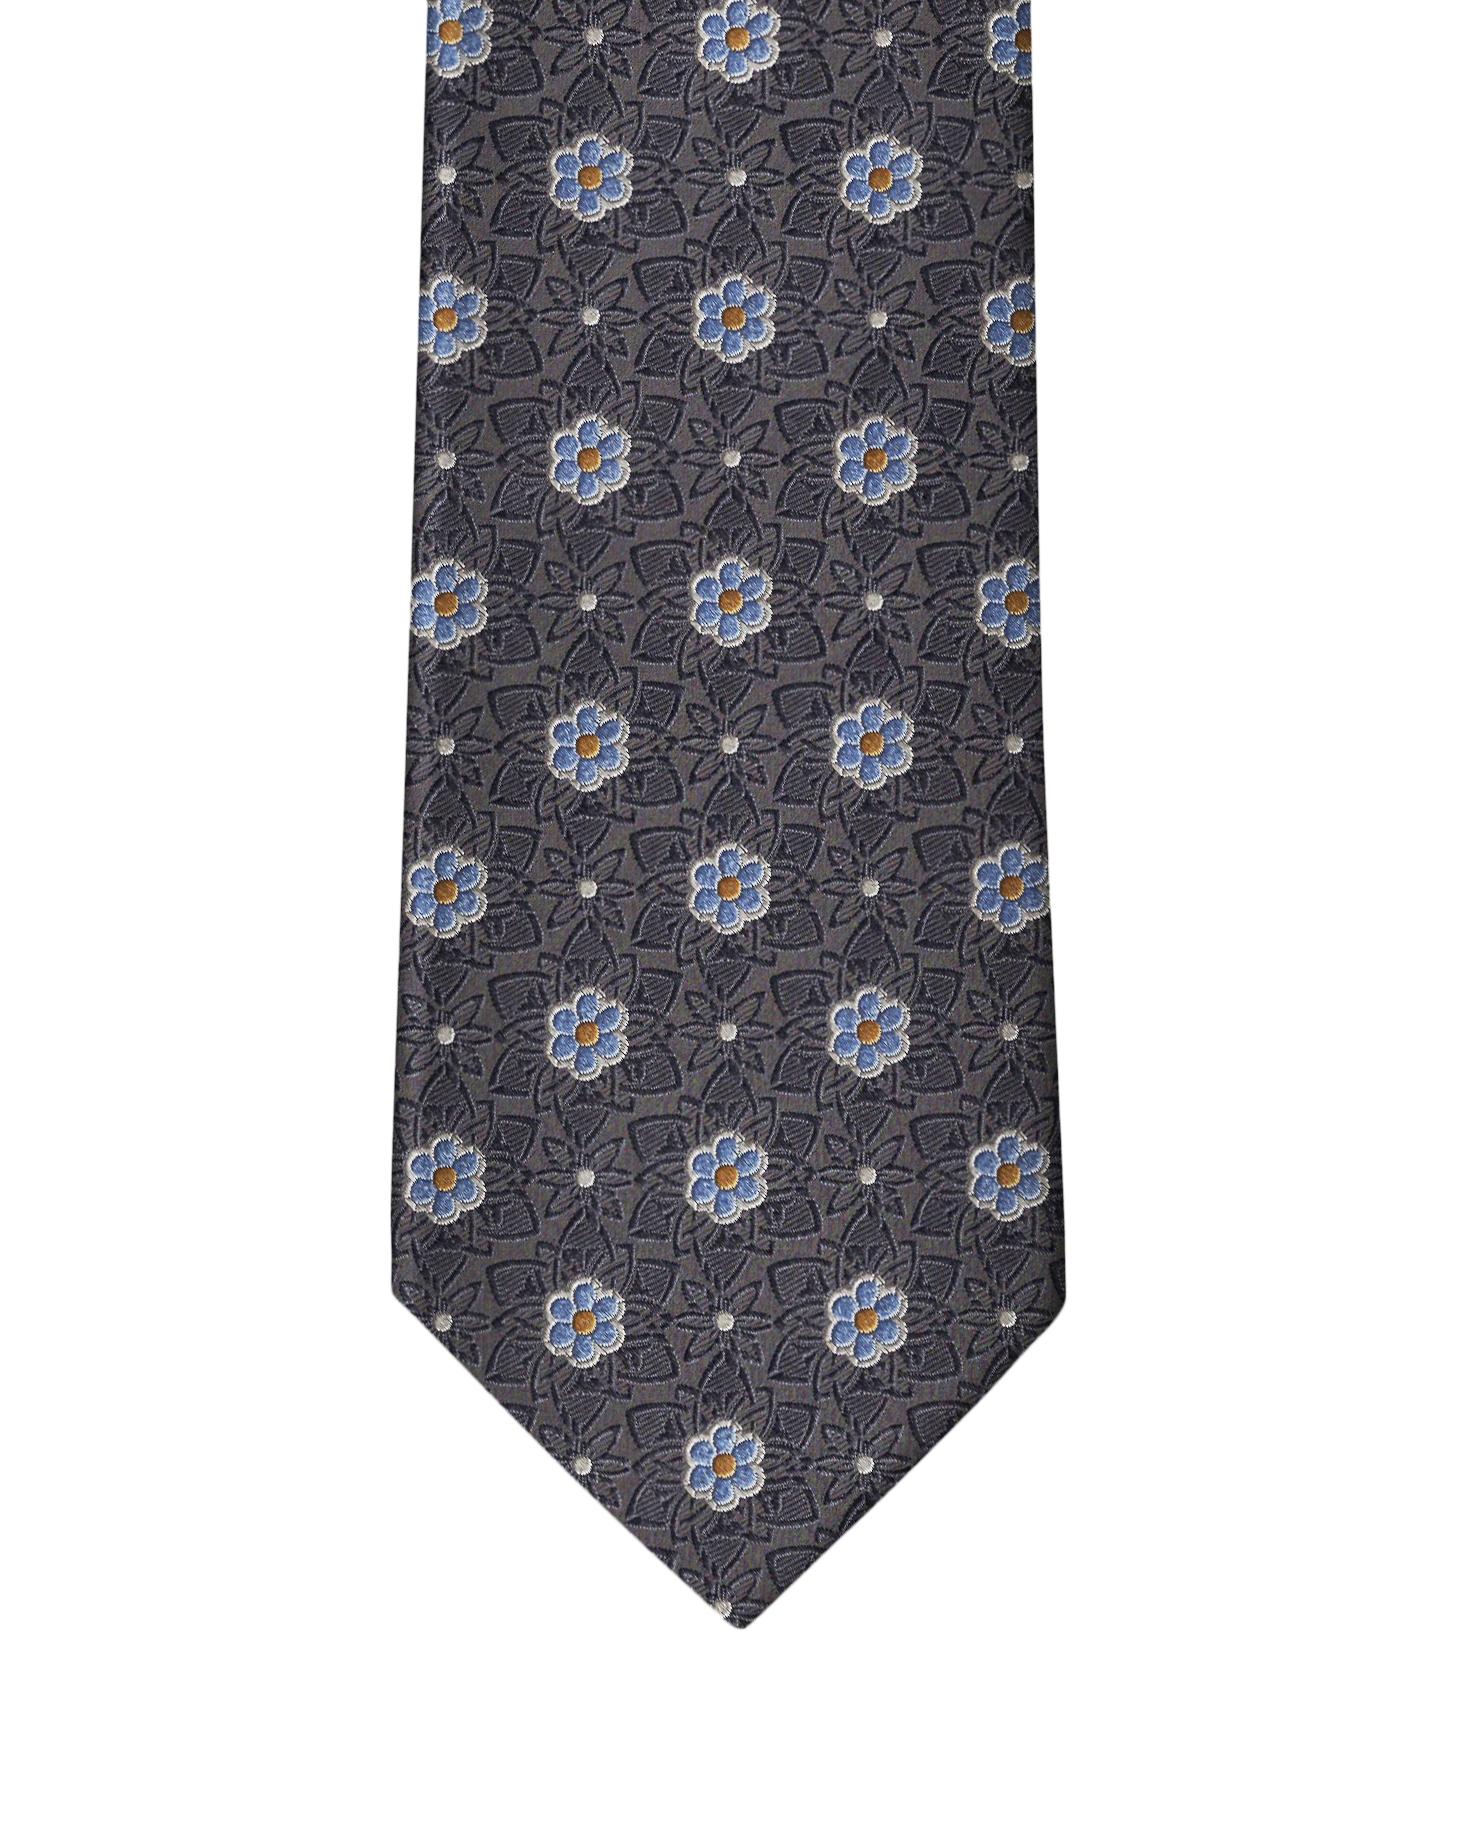 Slate Classic Flower Necktie